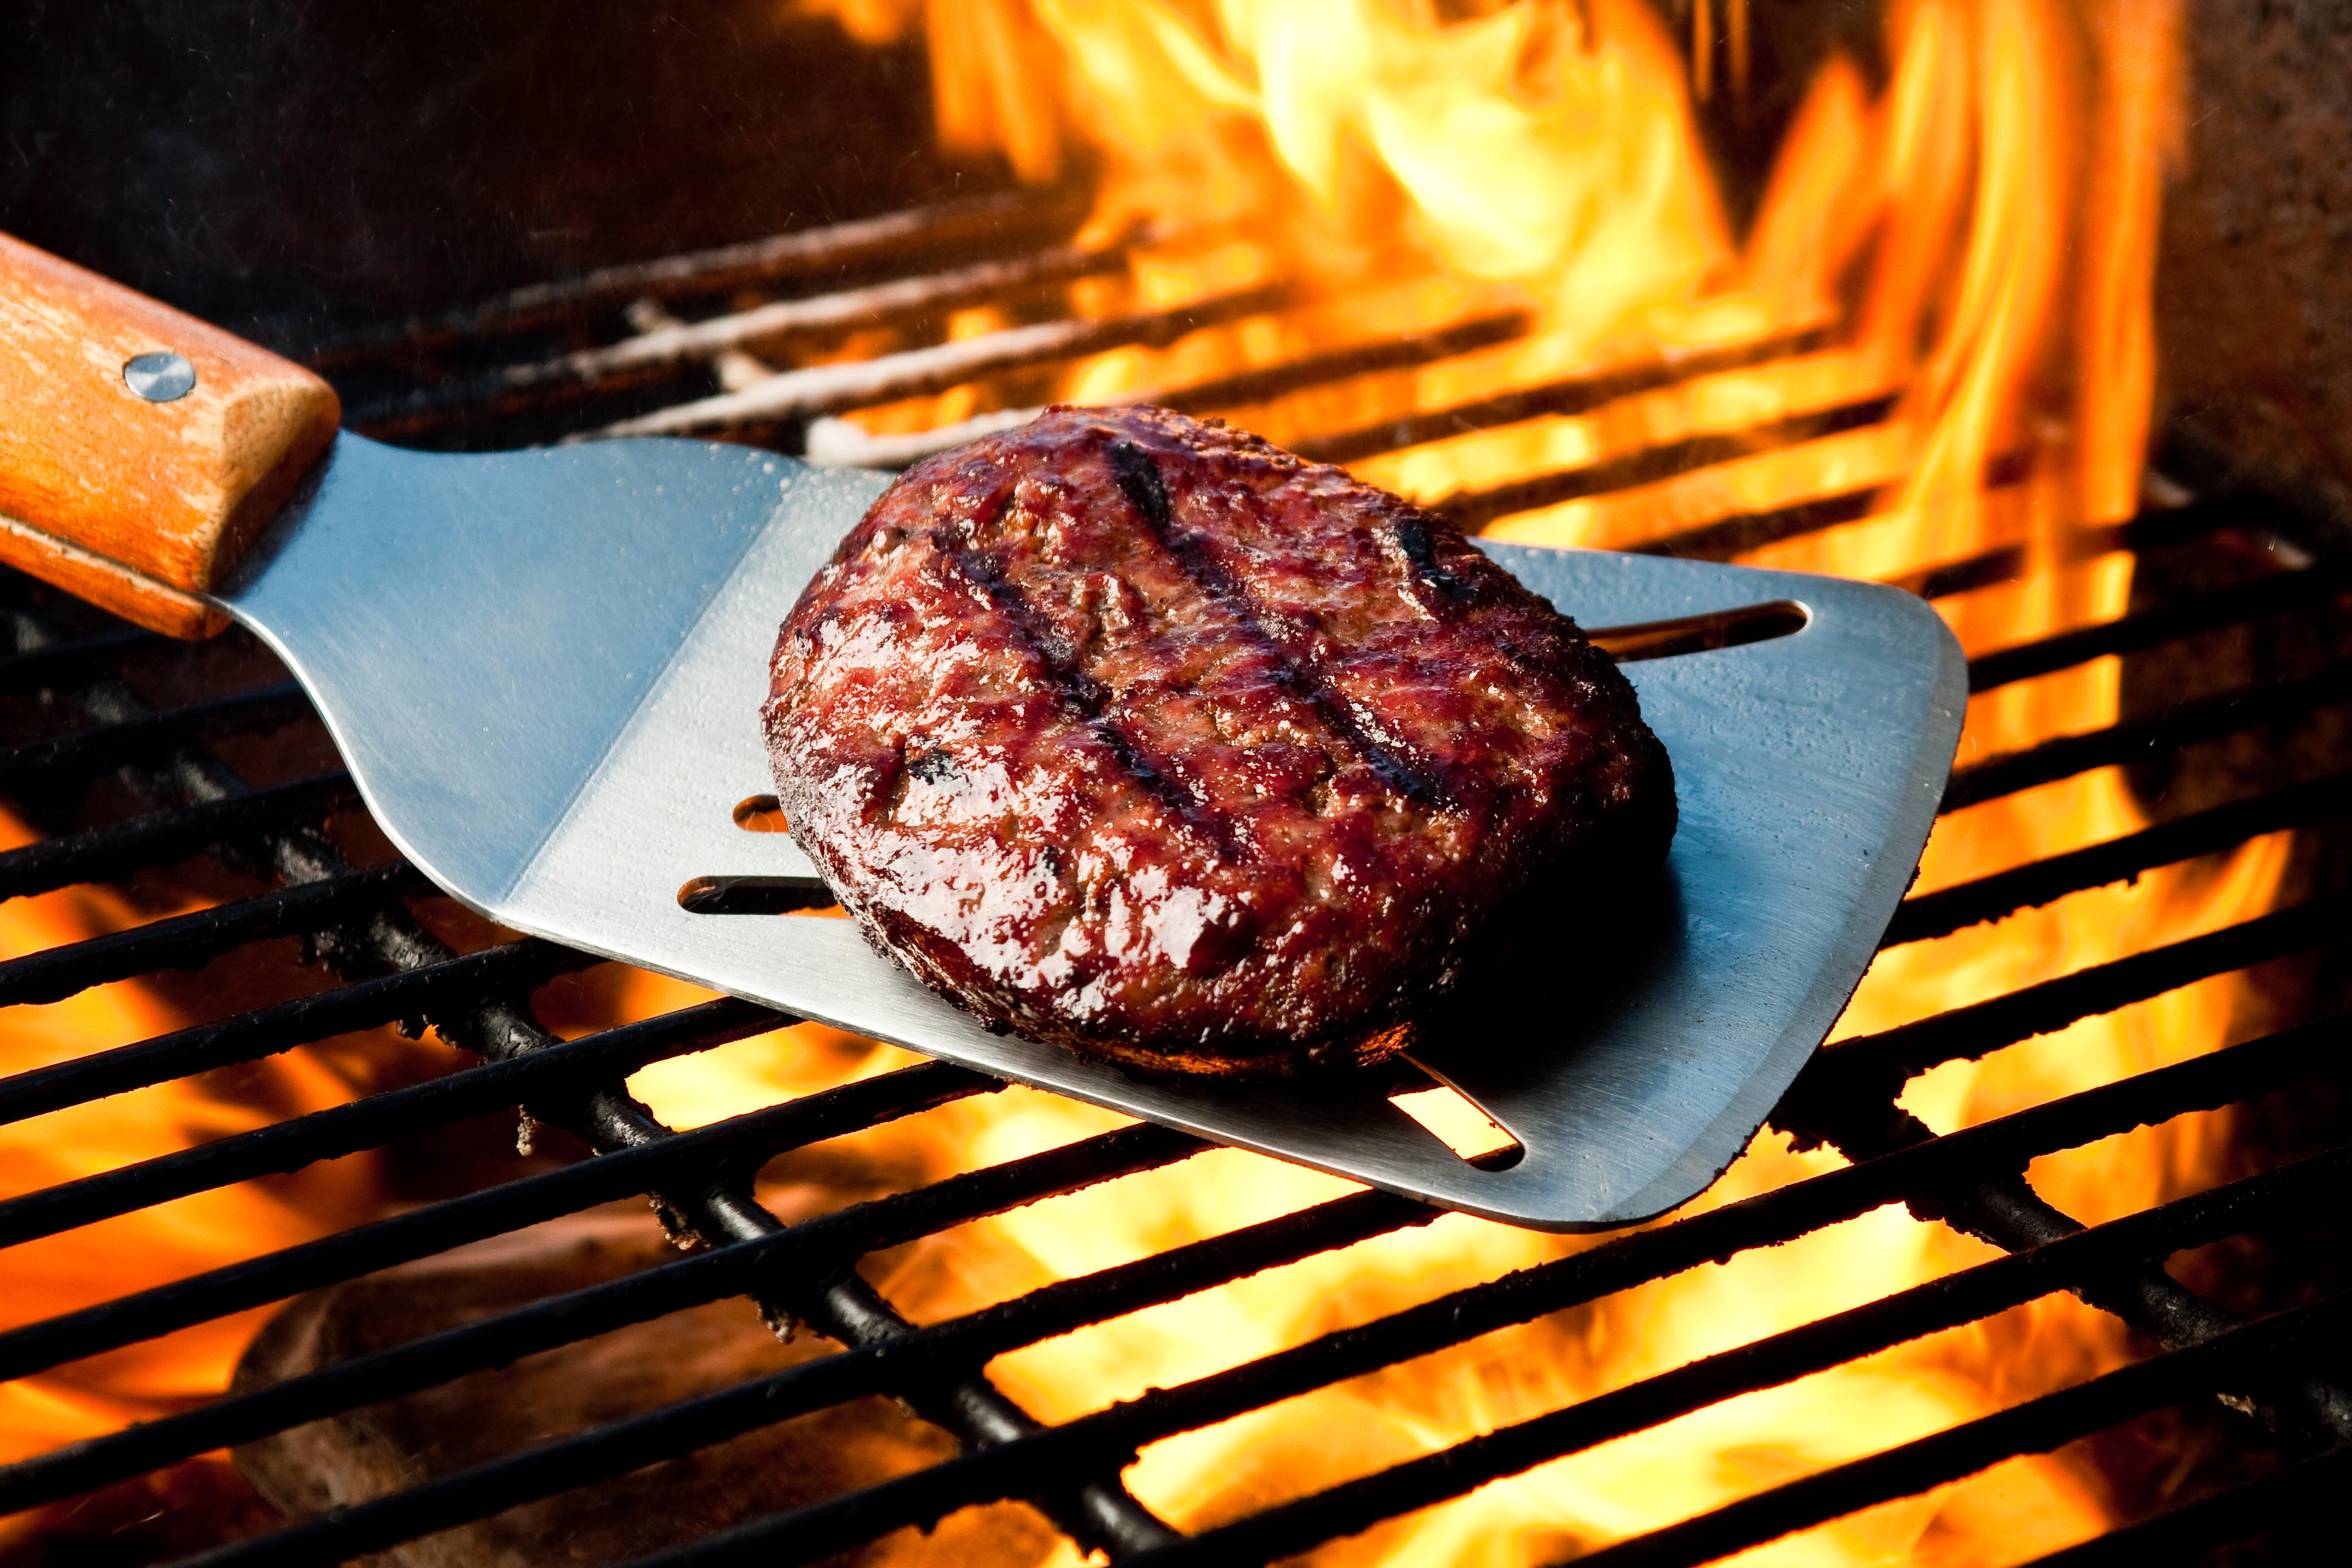 Una hamburguesa braseada en una espátula sobre una llama.